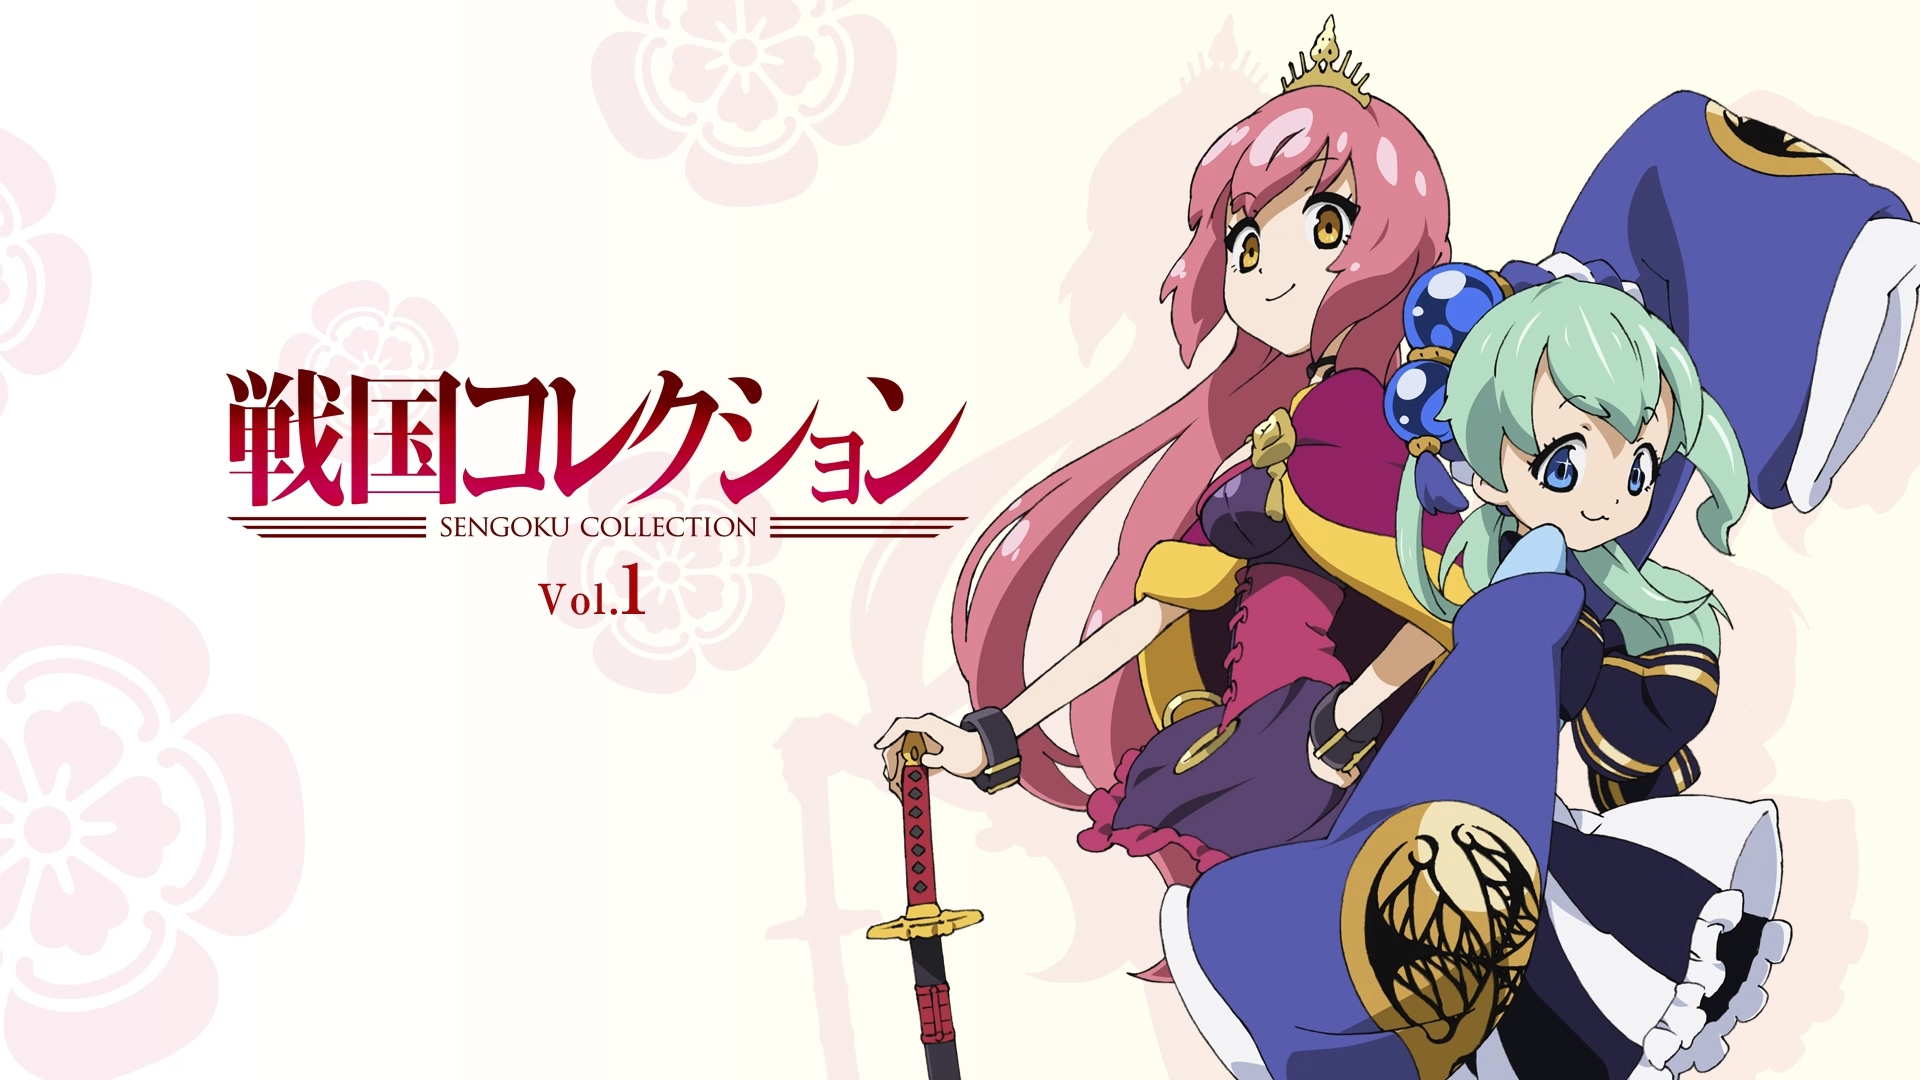 Sengoku Collection HD Wallpaper #1167050 - Zerochan Anime Image Board